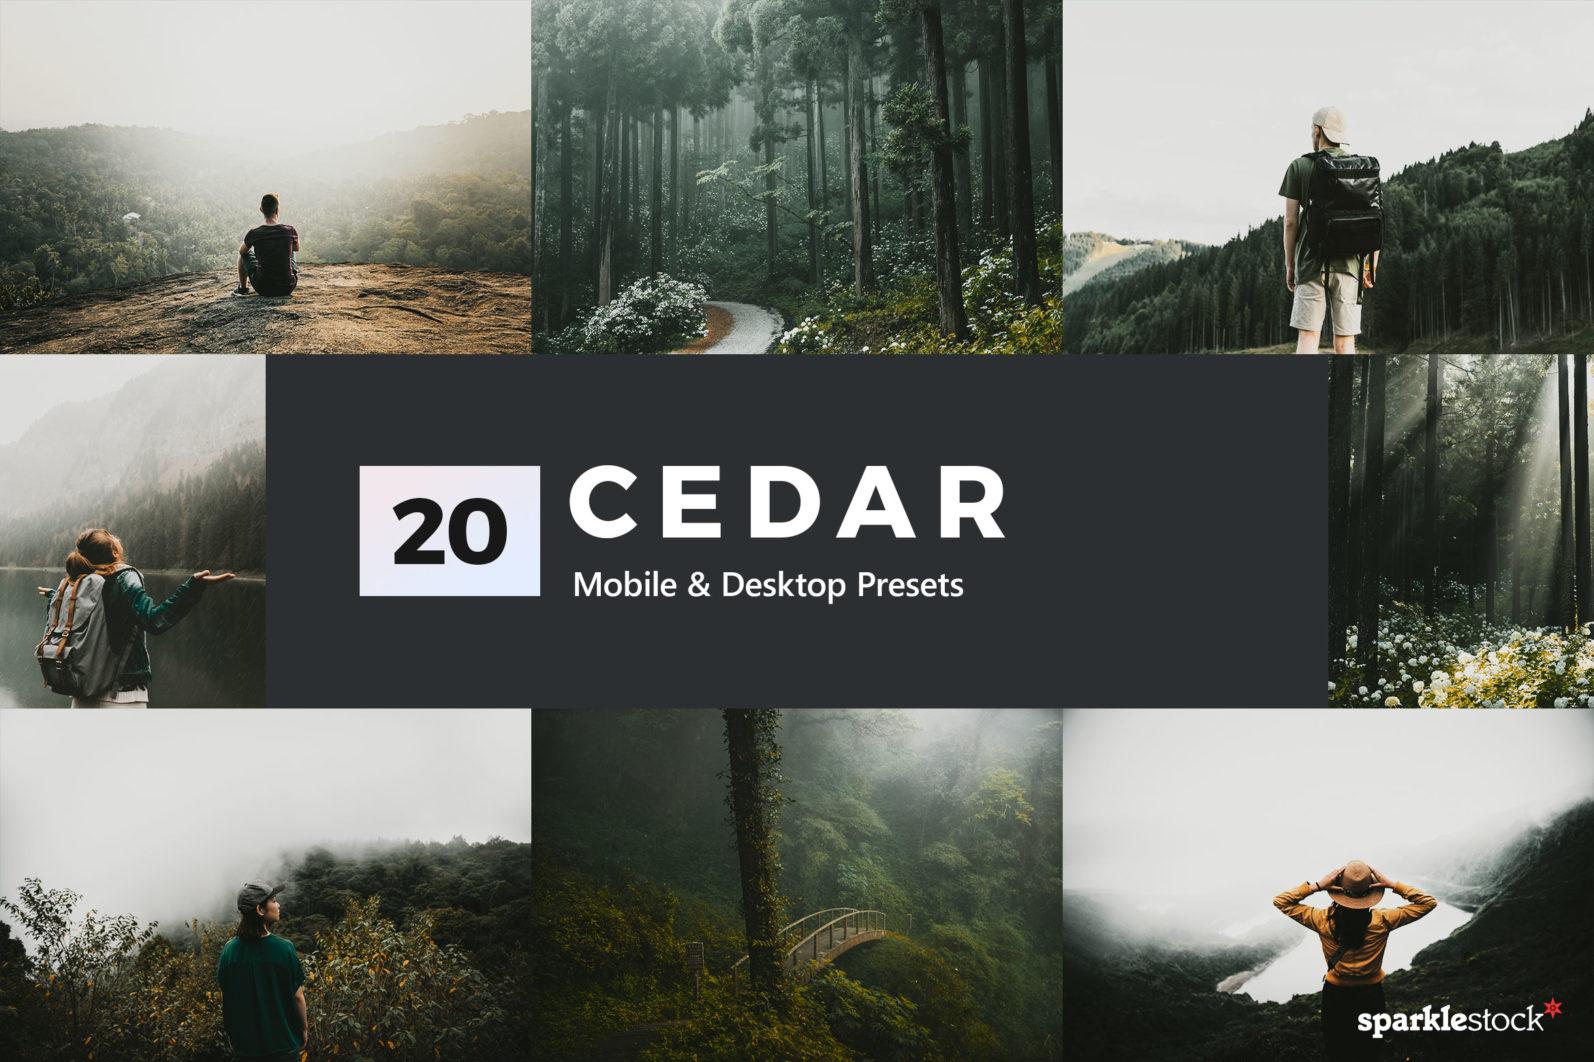 20 Cedar Lightroom Presets and LUTs - 01 21 -